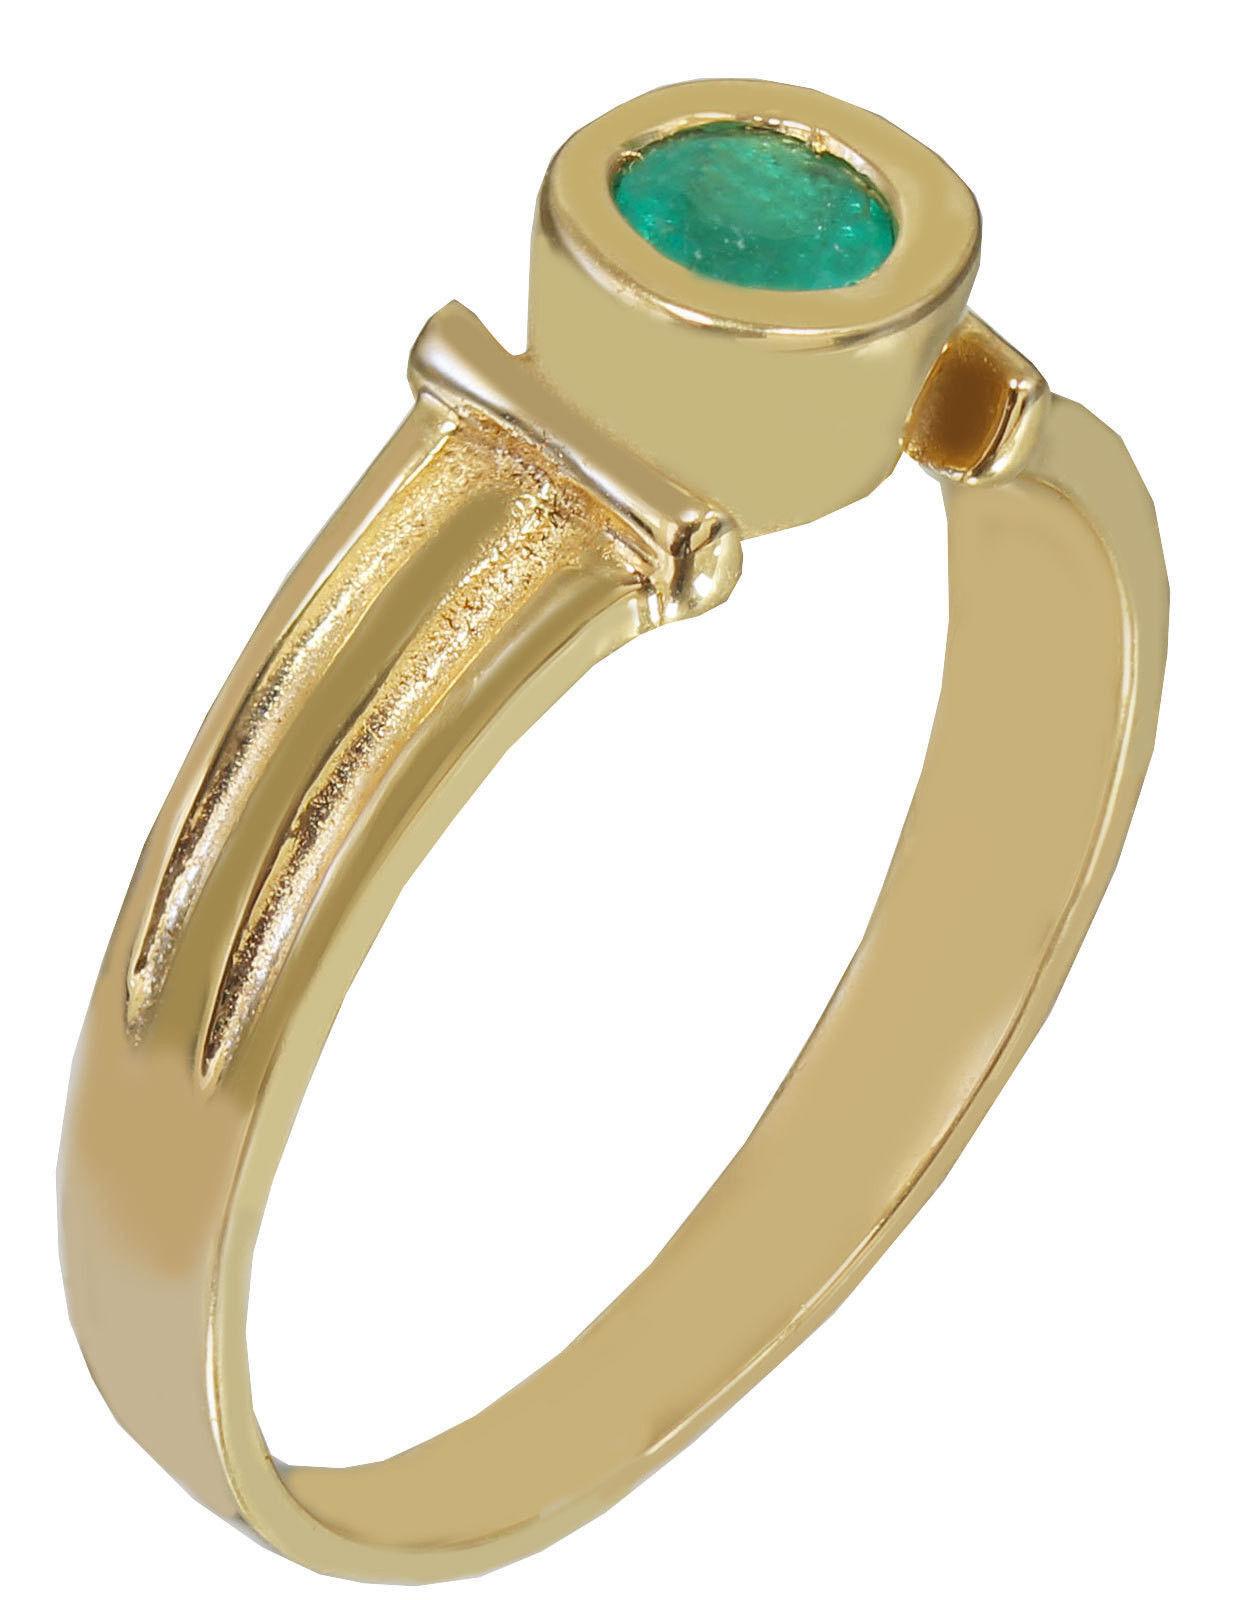 18k Yellow gold Round Cut Emerald Bezel Set Art Deco Style Bridal Wedding 1.00ct